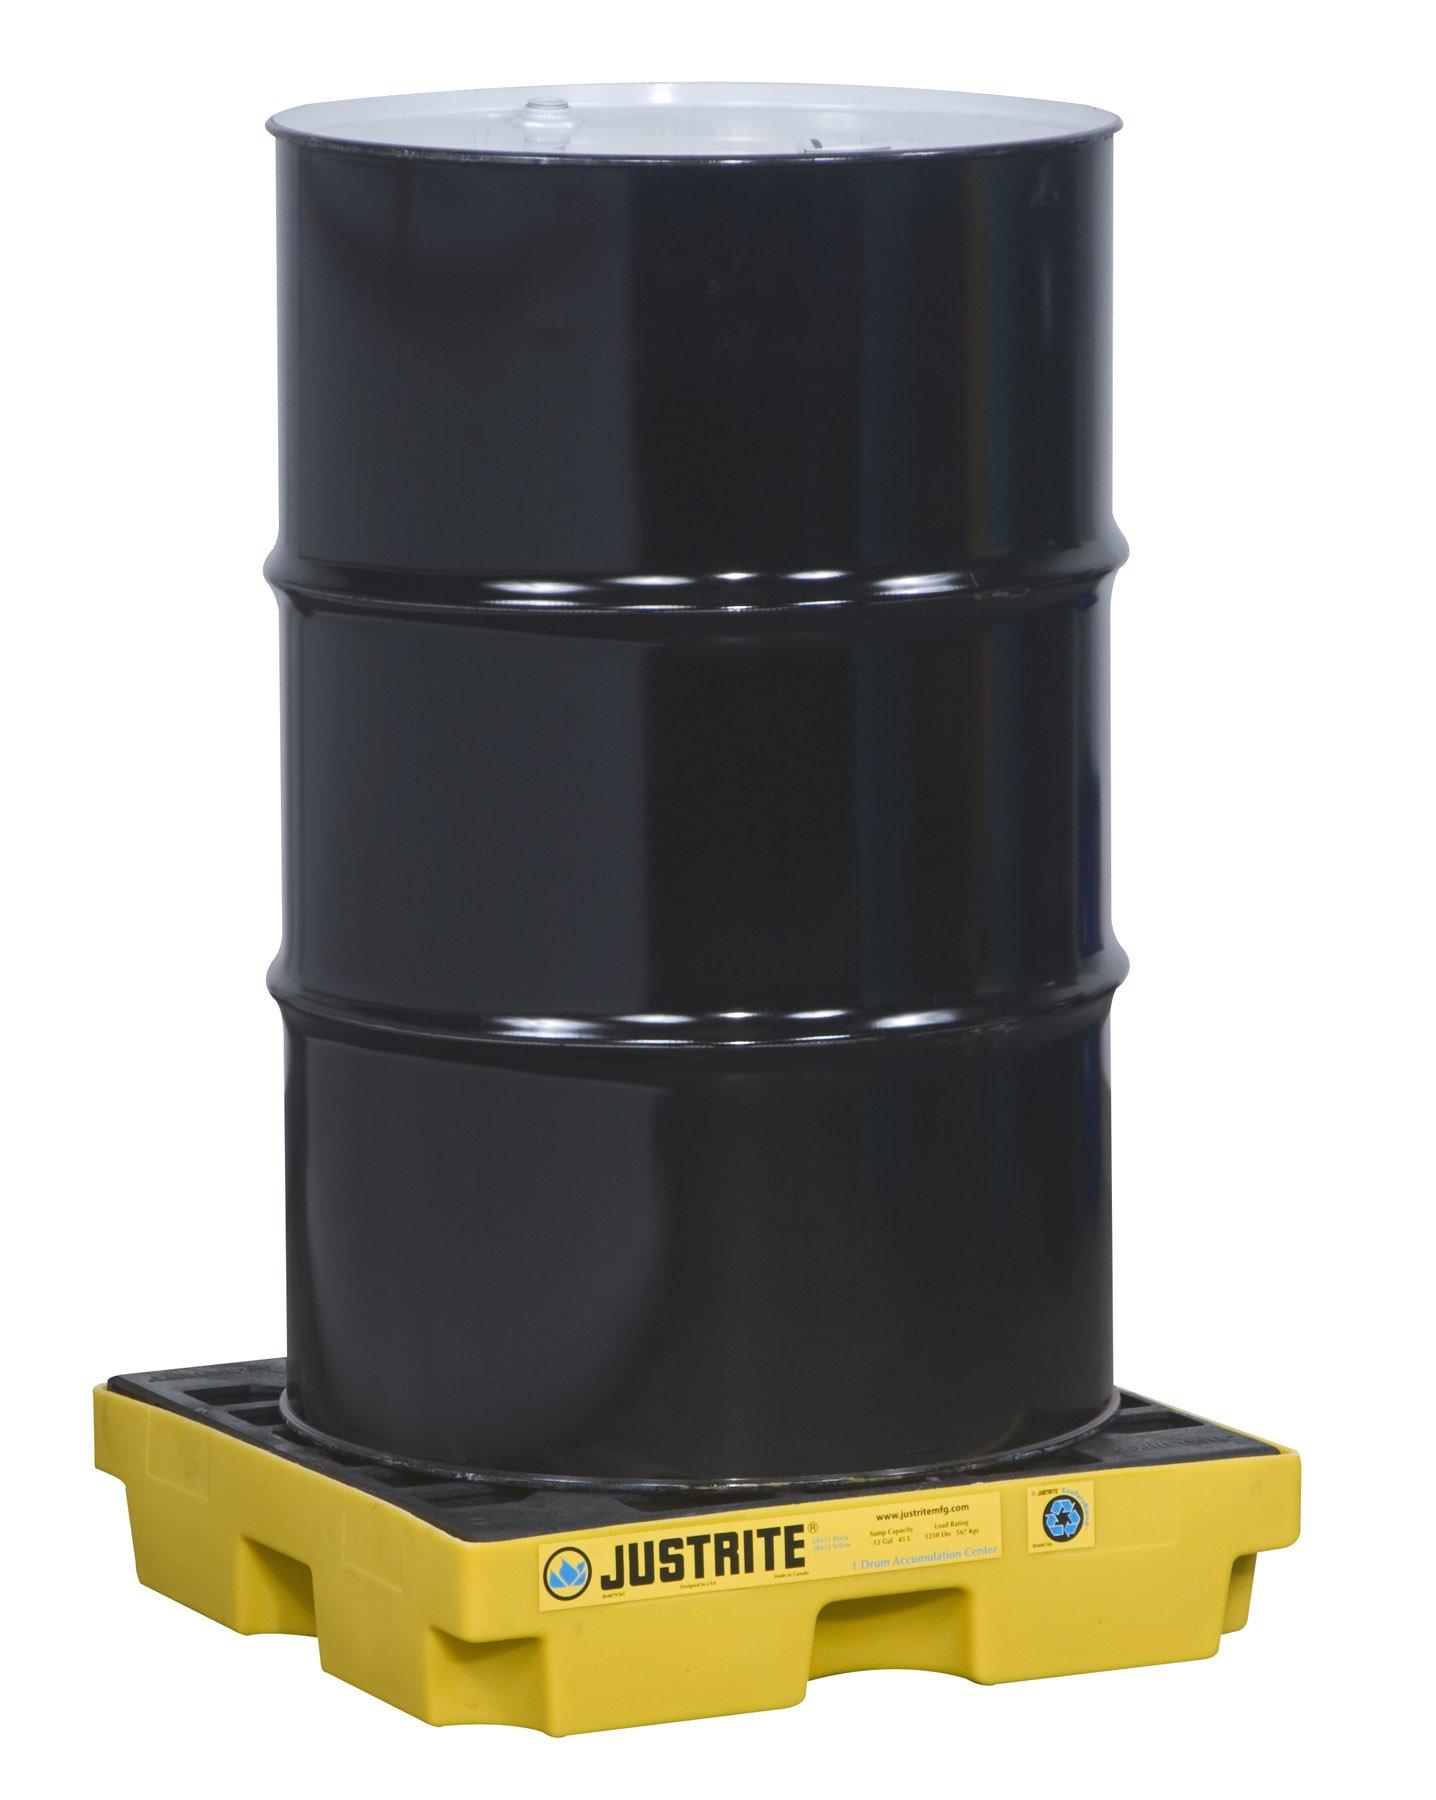 Justrite 28652 EcoPolyBlend 12 Gallon Sump, 25'' x 25'' x 5.5'' (LXWXH) Yellow 1 Drum Modular Accumulation Centers